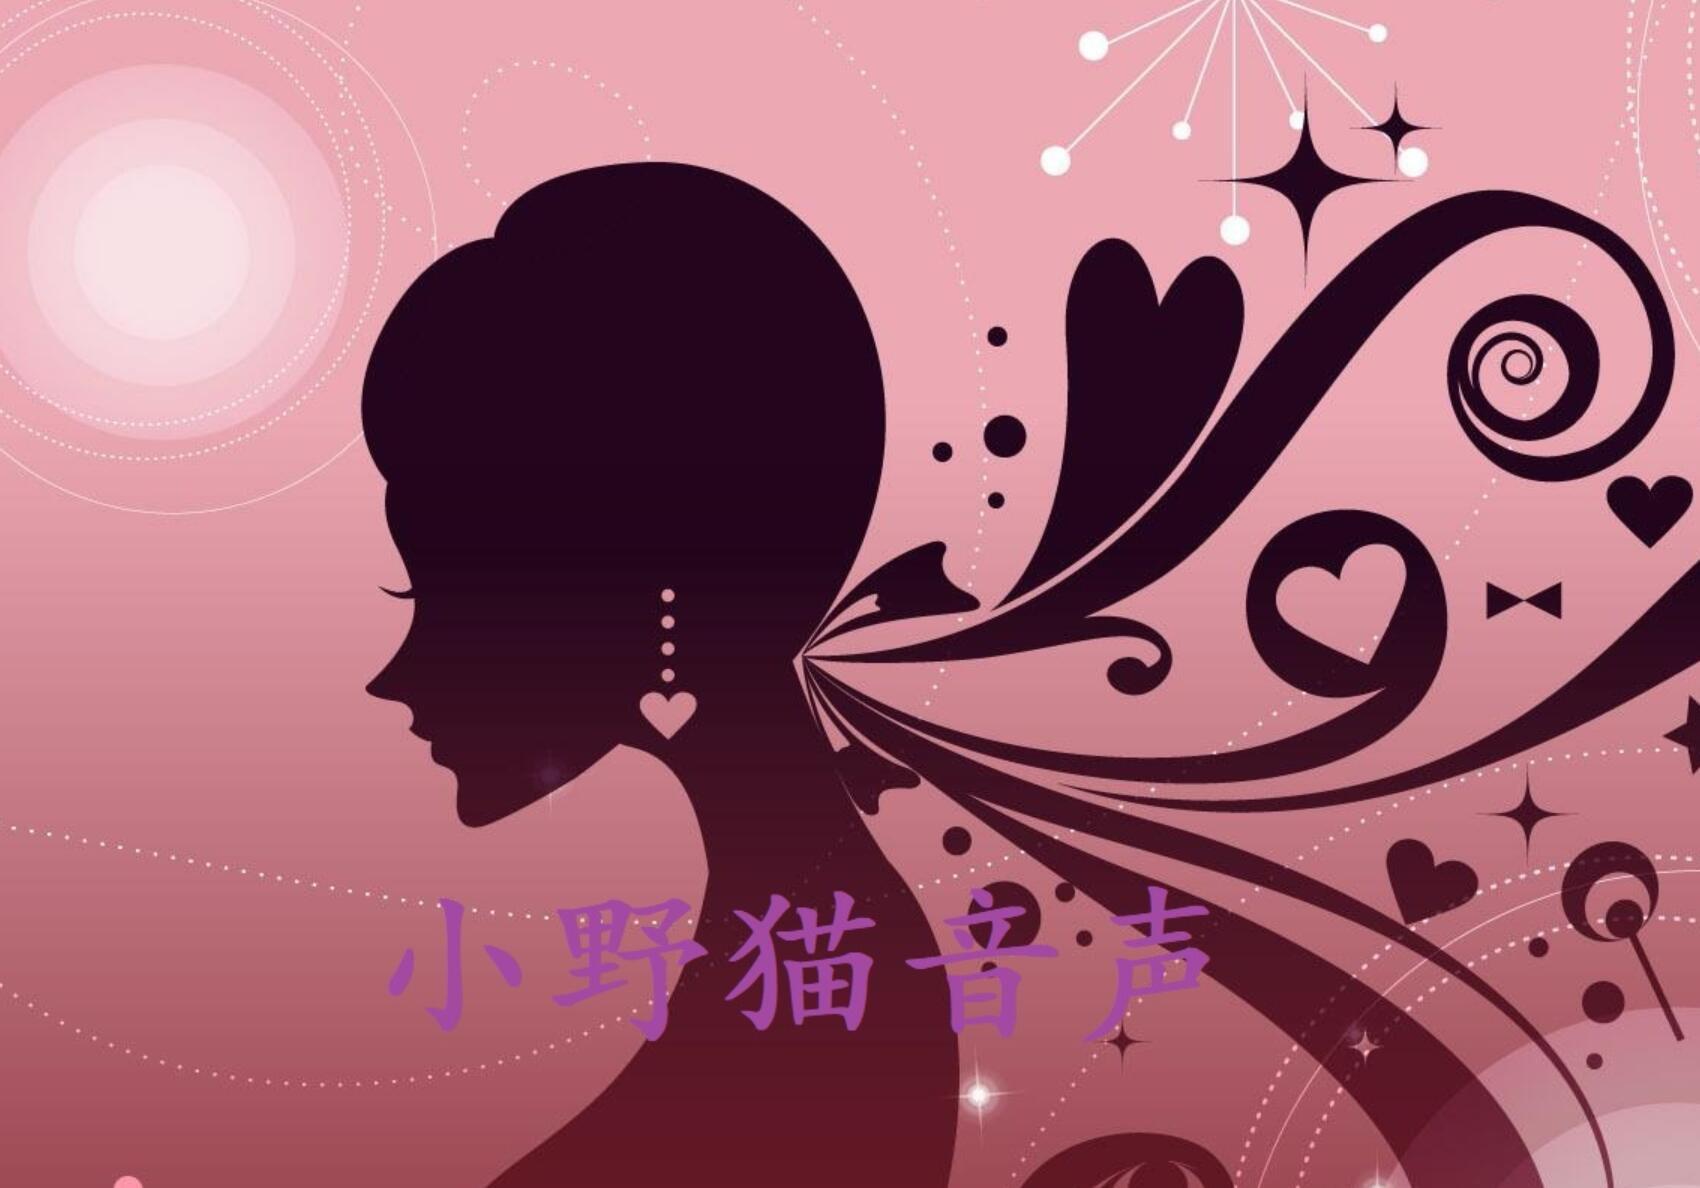 RJ316024 小野猫音声 吸血鬼少女的魅惑  CV青梅 [20210130]